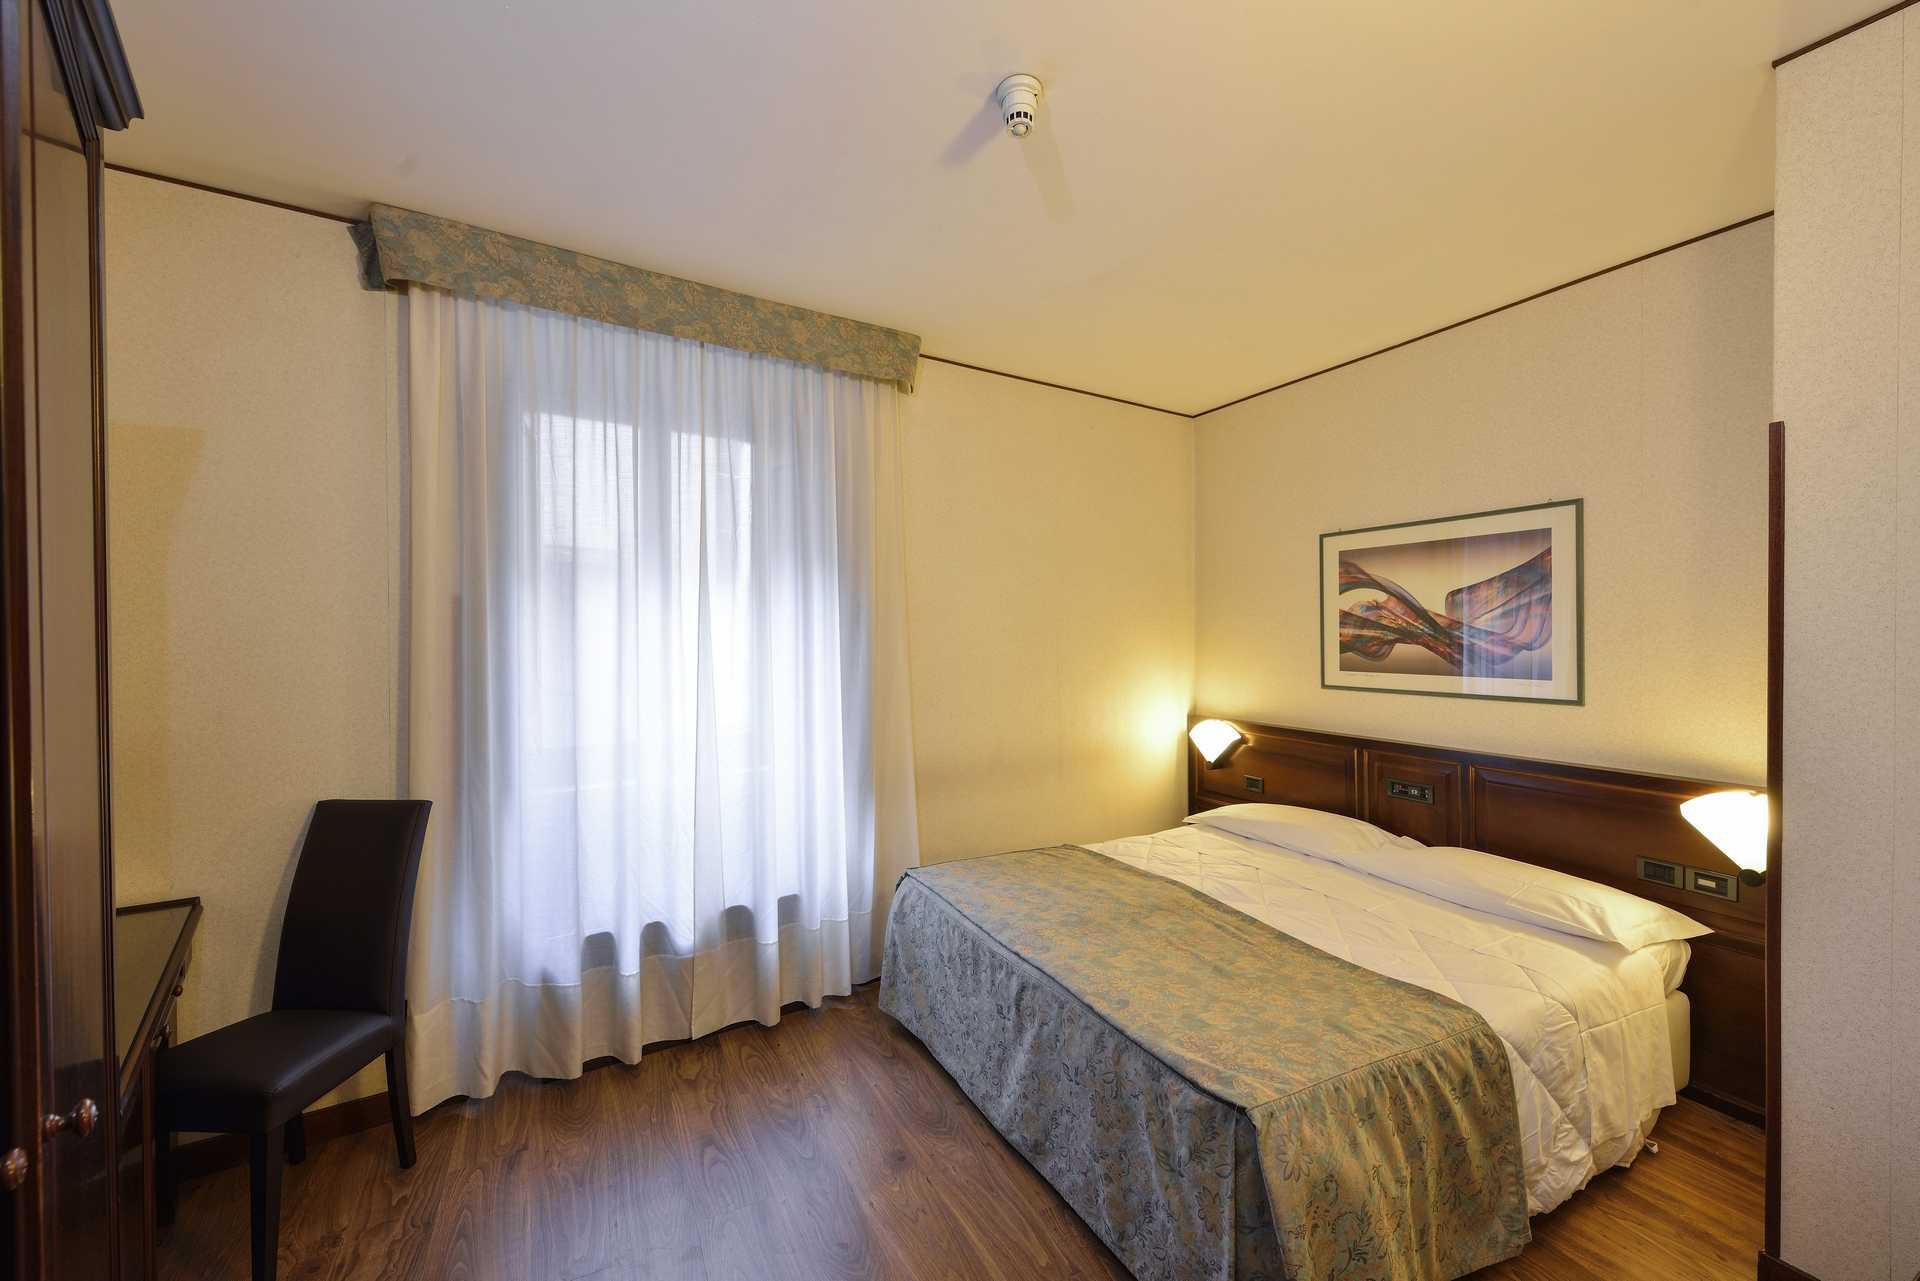 Hotel Fonte Cesia - Camera Economy- economy rooms